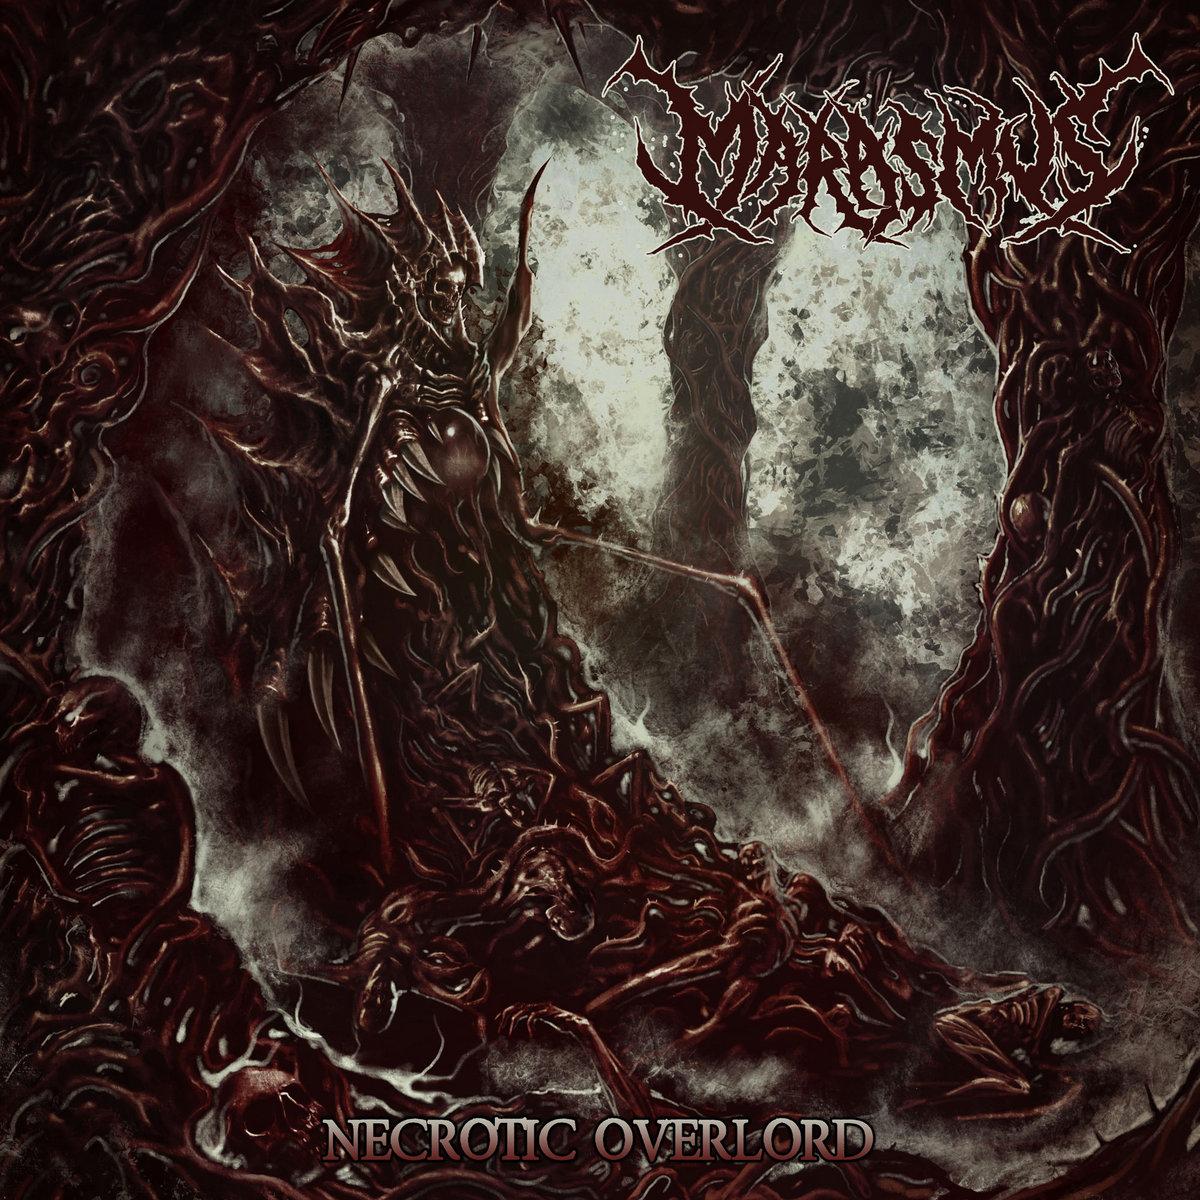 Necrotic Overlord (Death Metal) | MARASMUS (US) | Marasmus